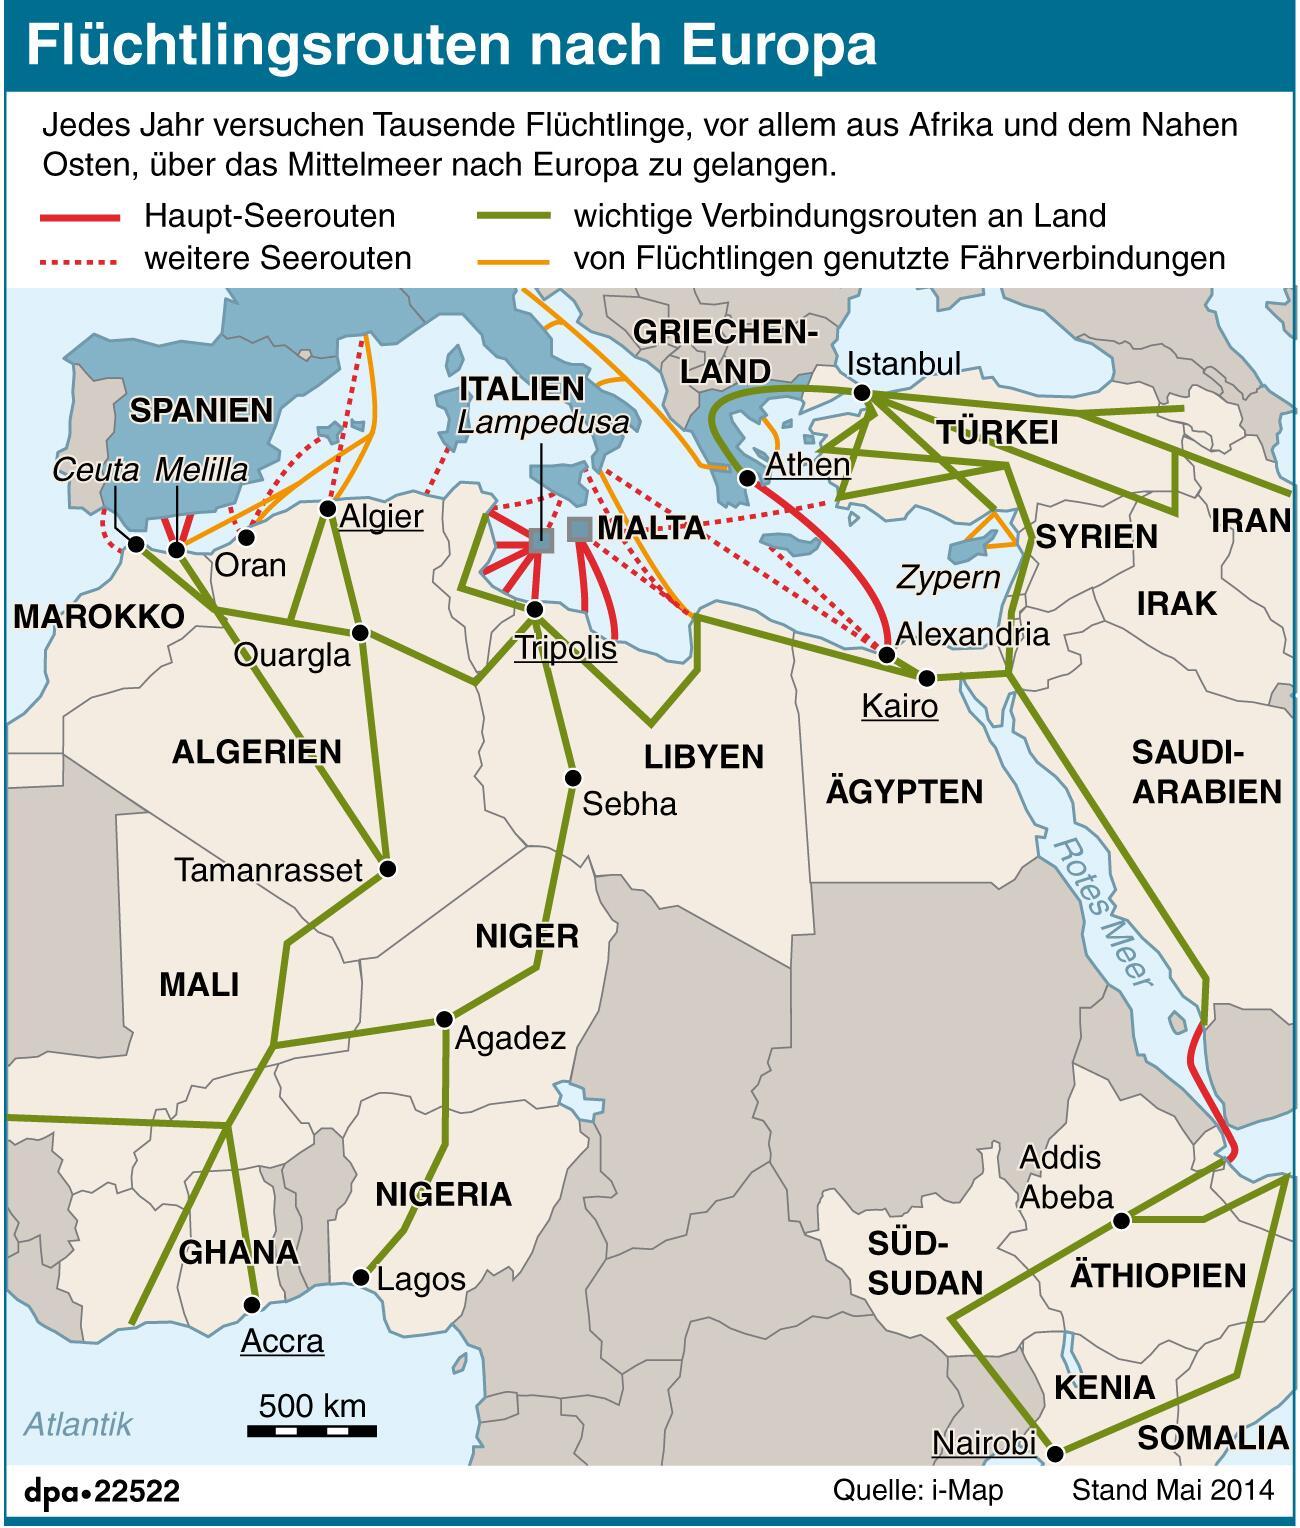 Bild zu Flüchtlingsrouten nach Europa